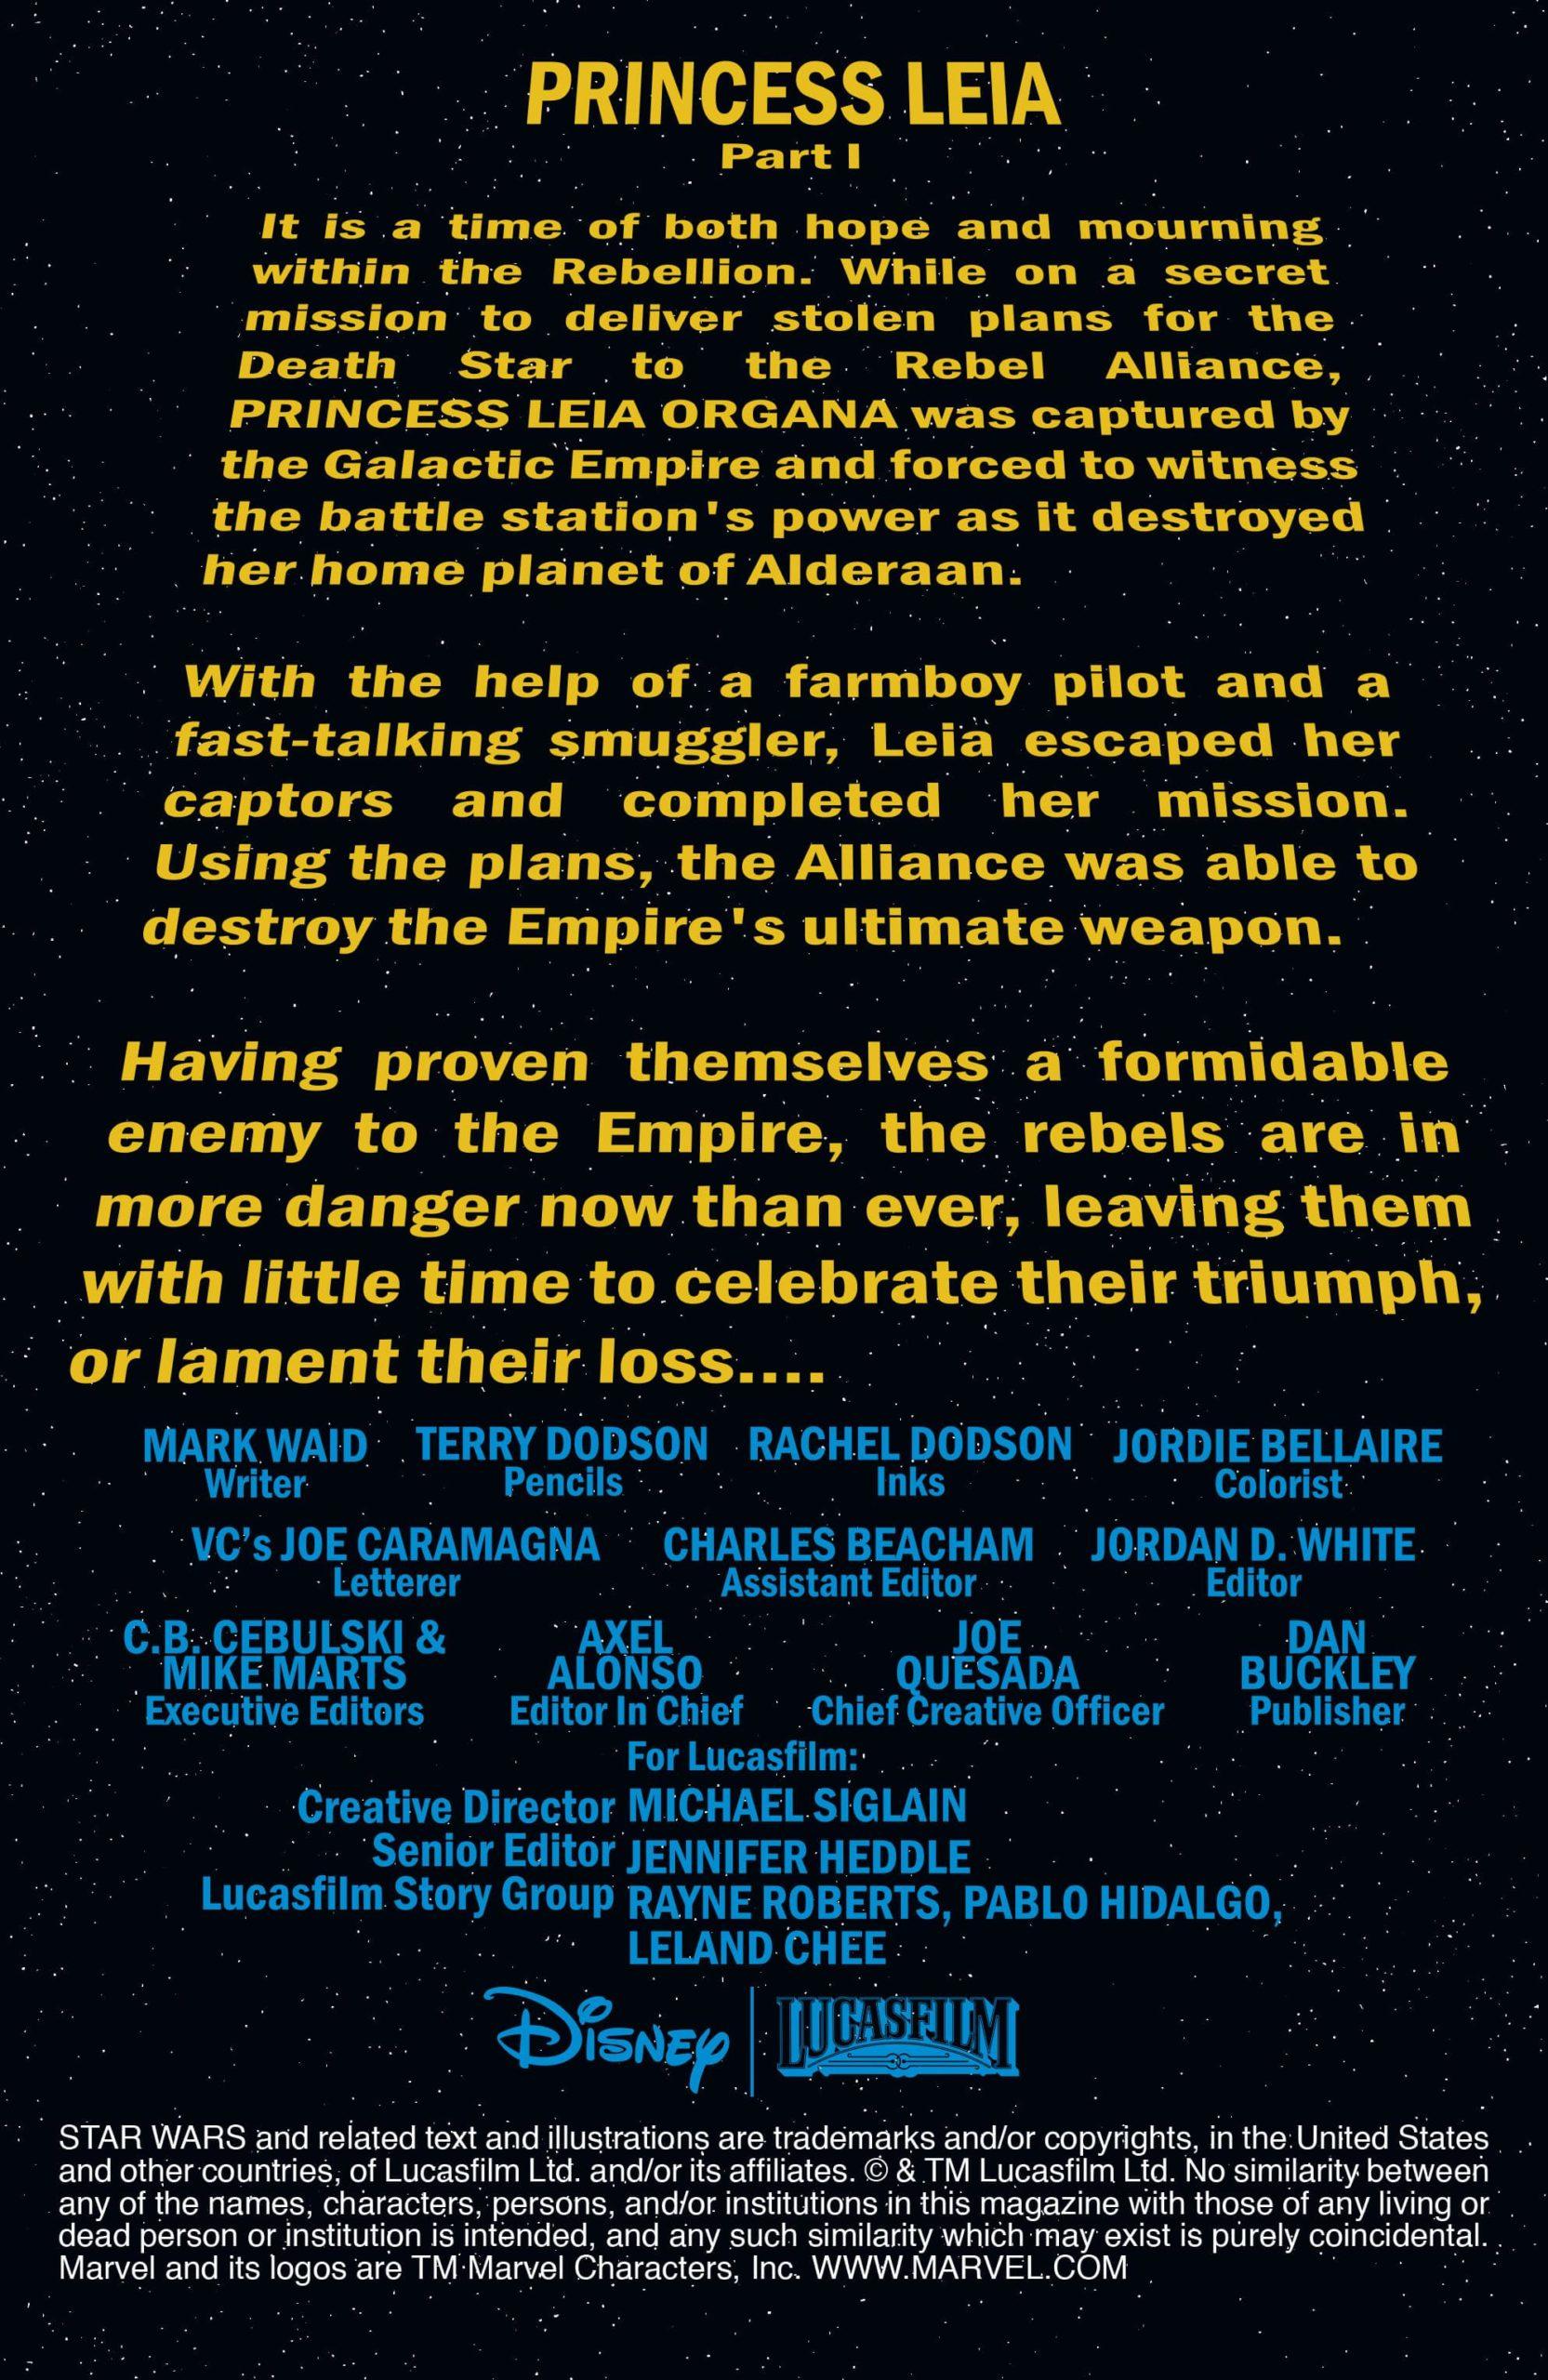 Princess Leia 1 #StarWars